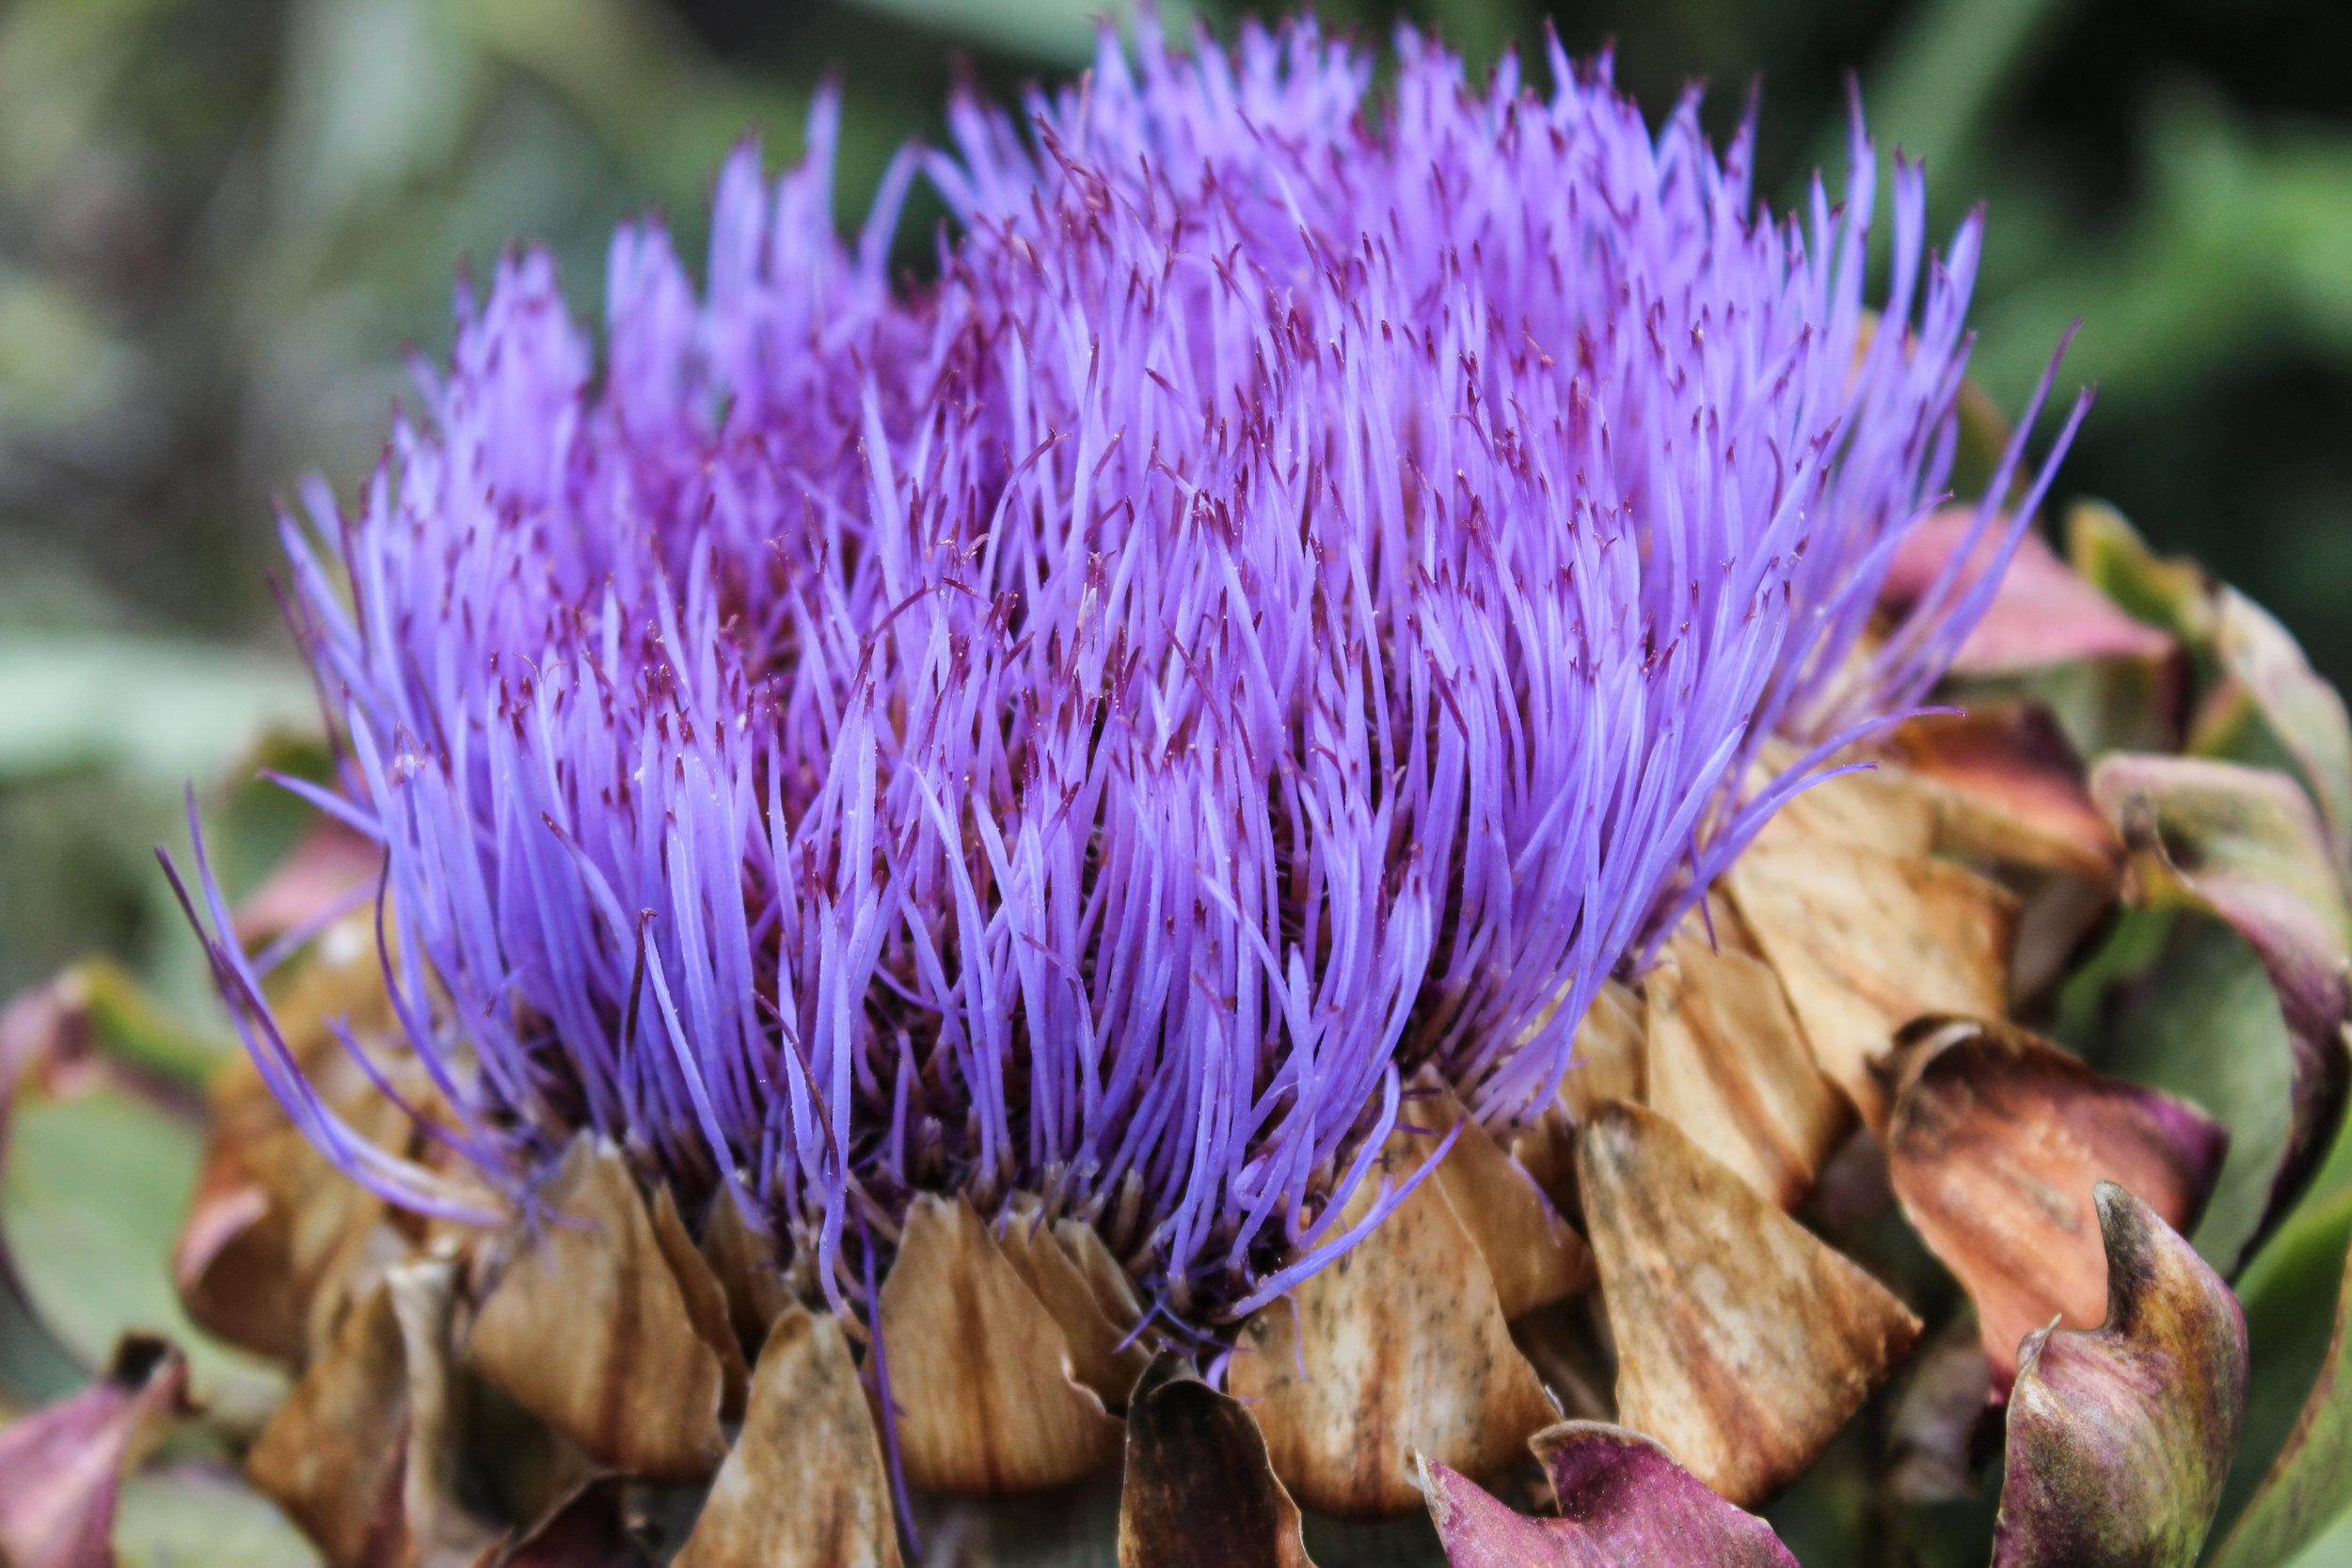 Cynara scolymus  (Globe Artichoke) - A herbal medicine used for liver and gallbladder issues